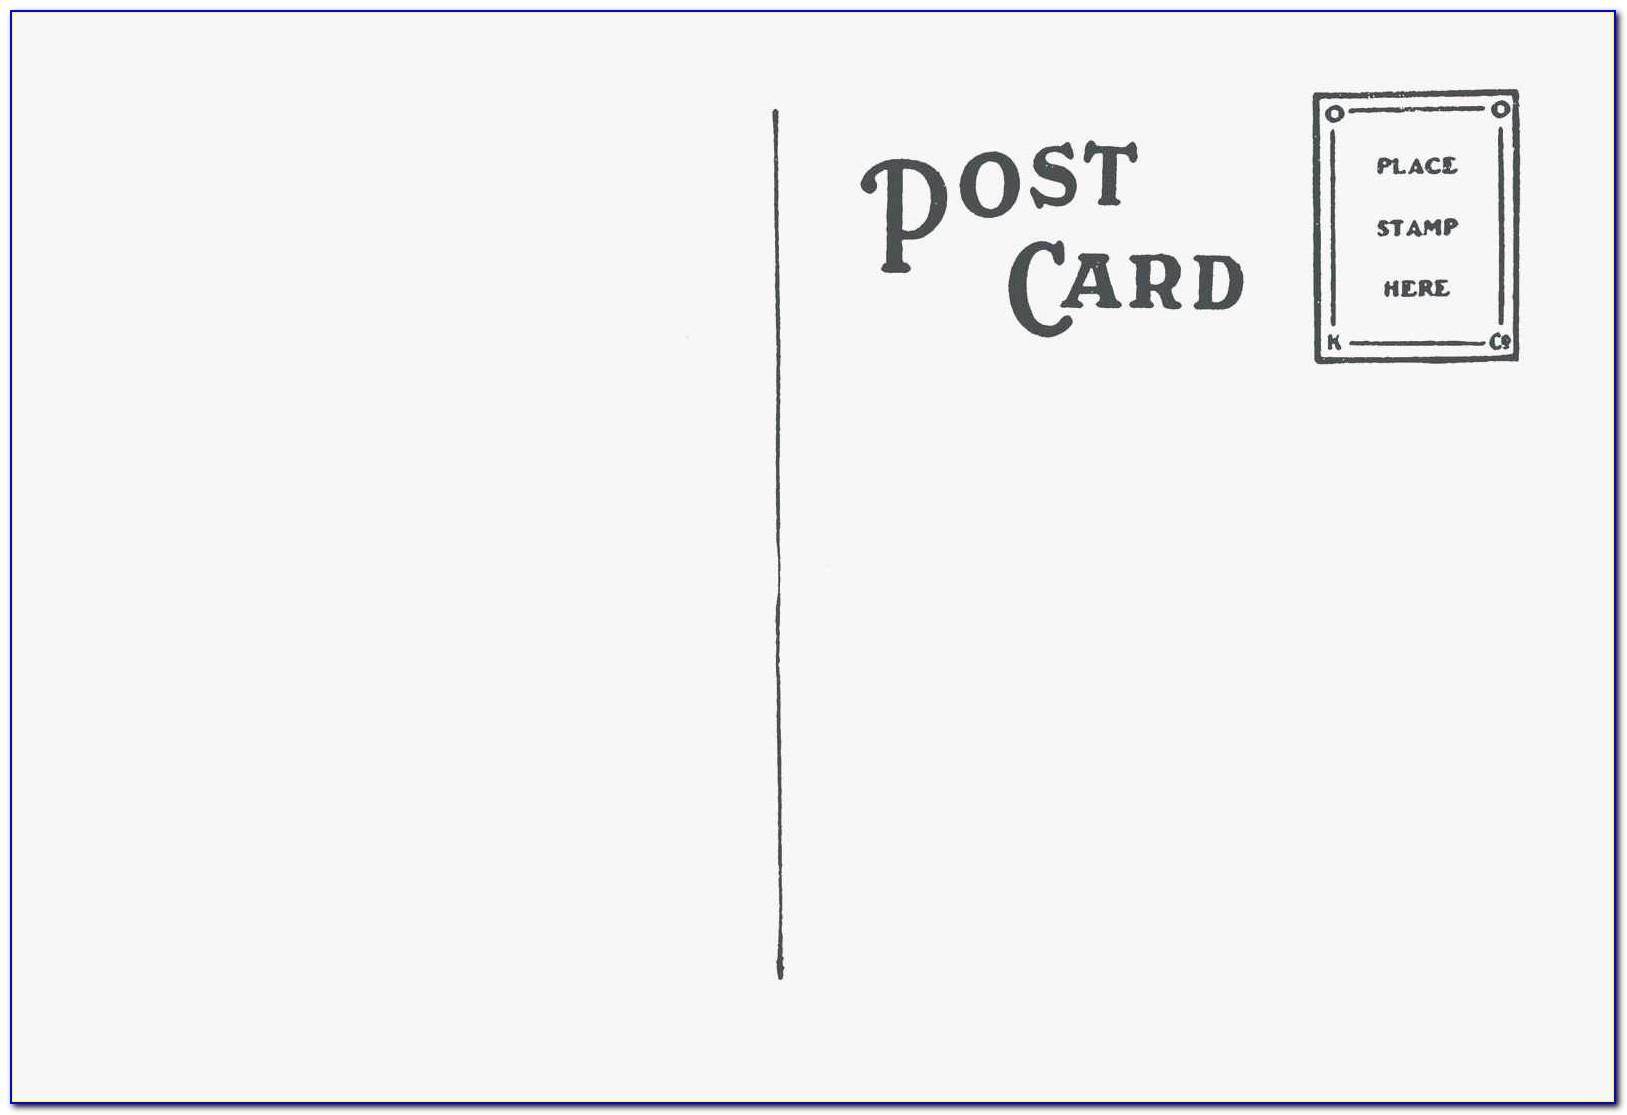 Avery Postcard Templates 5389 Beautiful Berühmt Avery Vorlage Postkarte Ideen Entry Level Resume Vorlagen